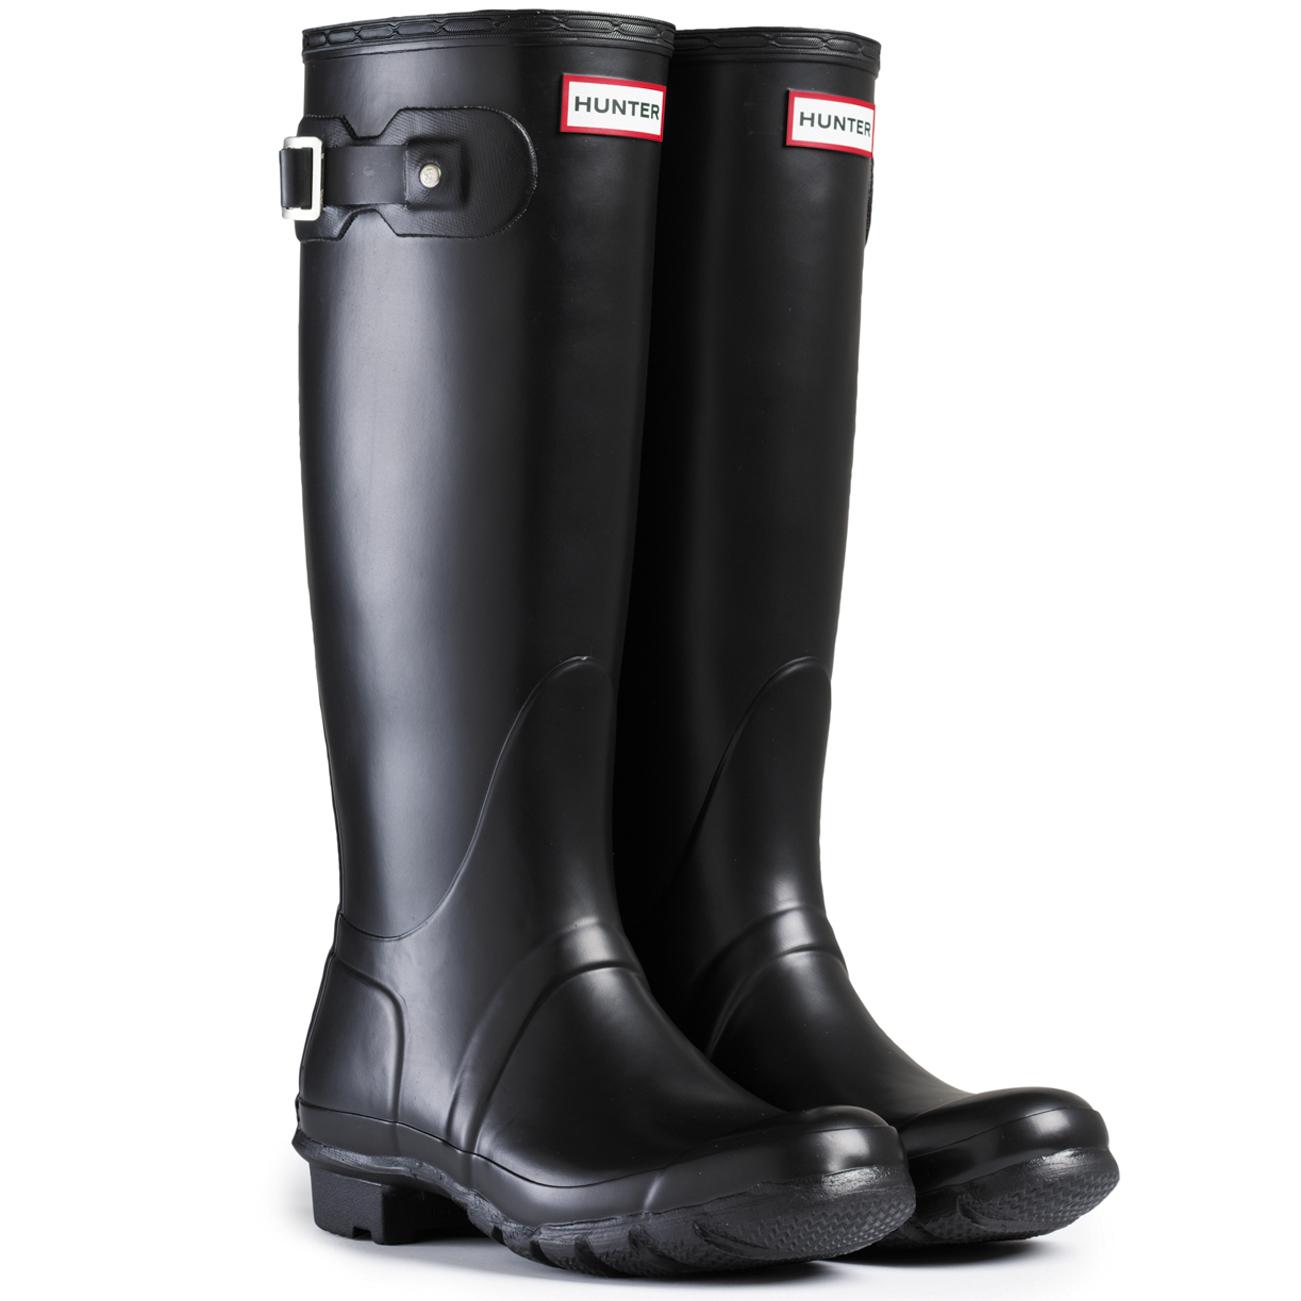 Creative Womens Hunter Original Slim Two Toned Wellington Festival Snow Rain Boots UK 3-8 | EBay